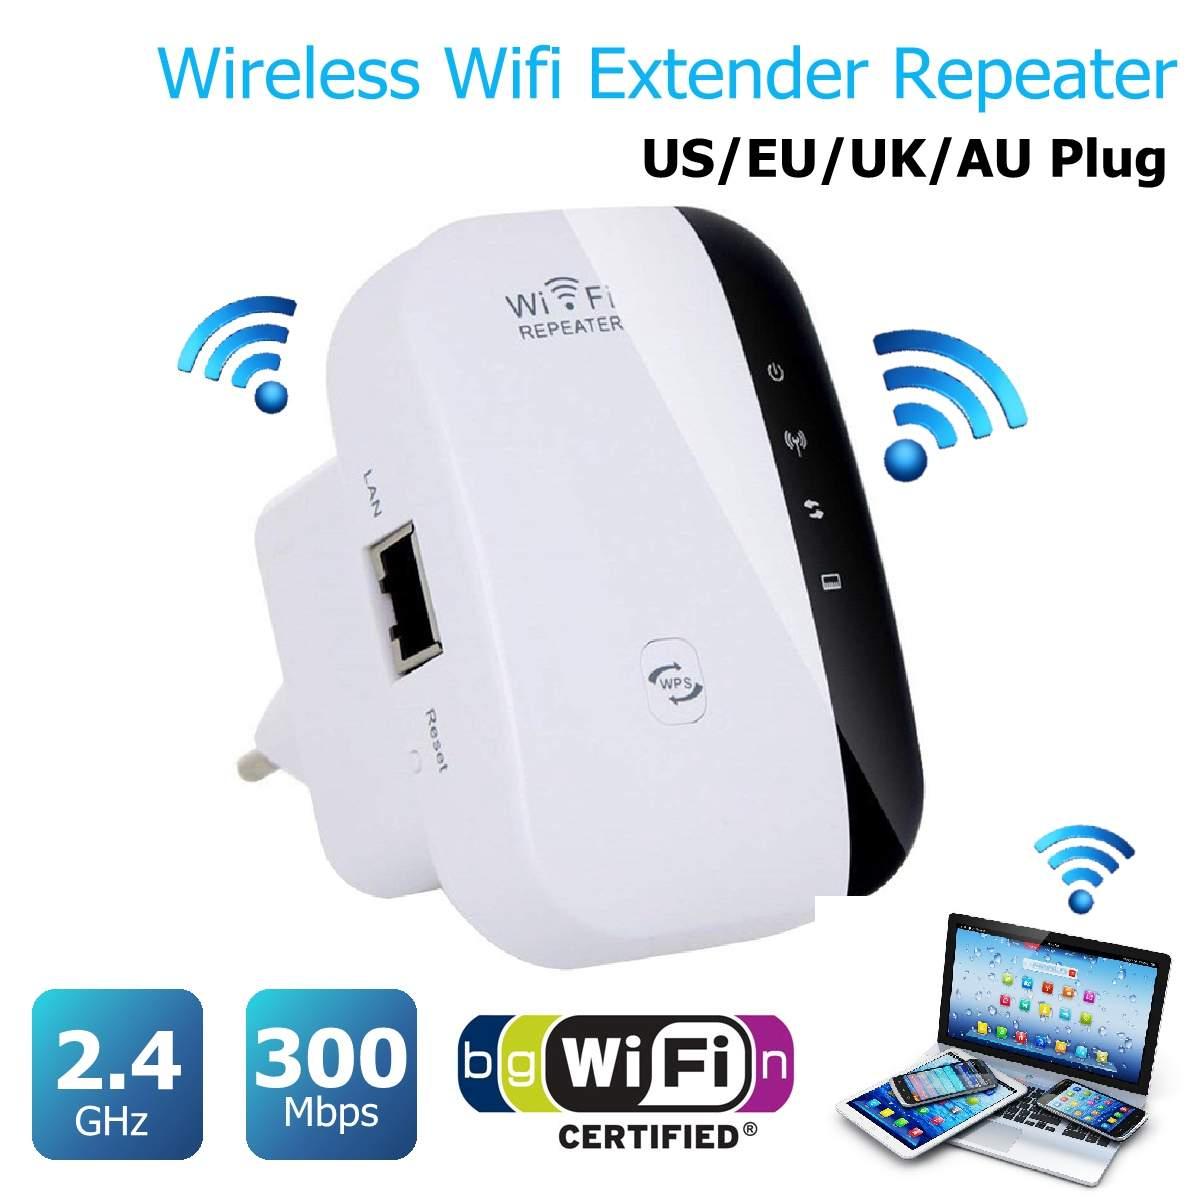 Leory 300 mbps sem fio wi fi repetidor extensor wi-fi faixa de sinal amplificador impulsionador mini 2.4g tp ligação wi fi hotspot wlan tplink